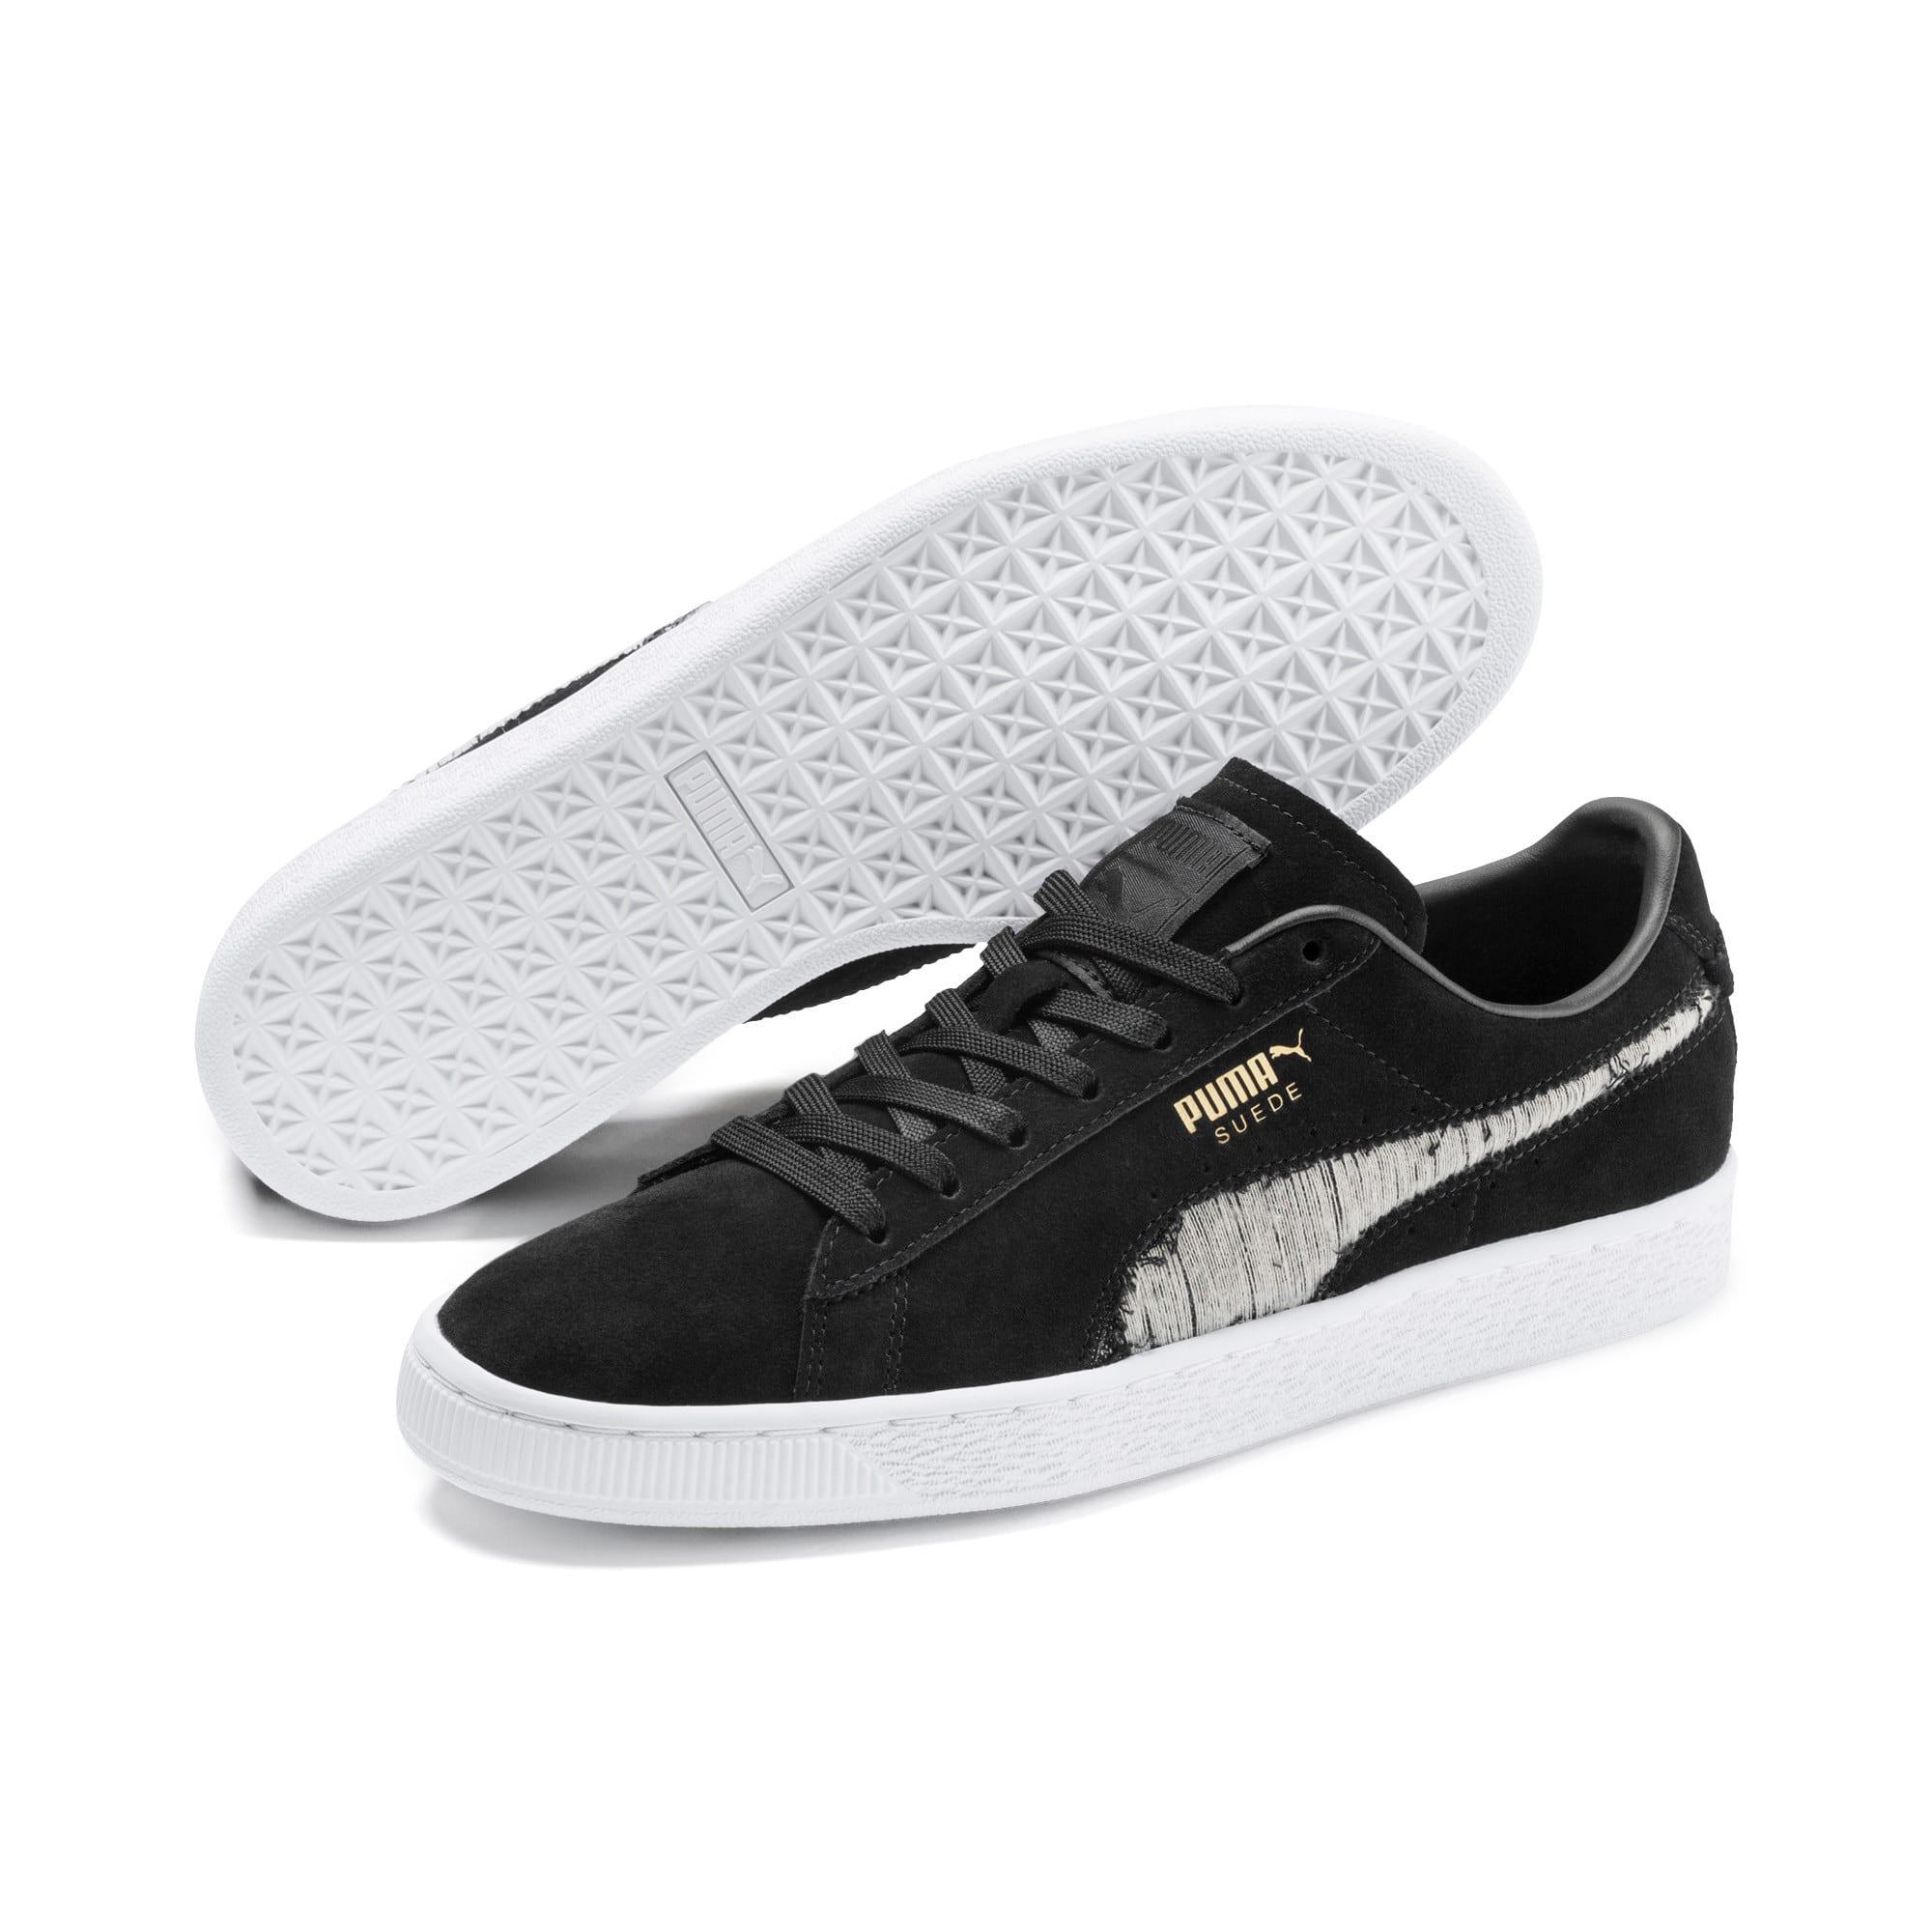 Thumbnail 2 of Suede Ripped Denim Sneakers, Puma Black-P Black-P White, medium